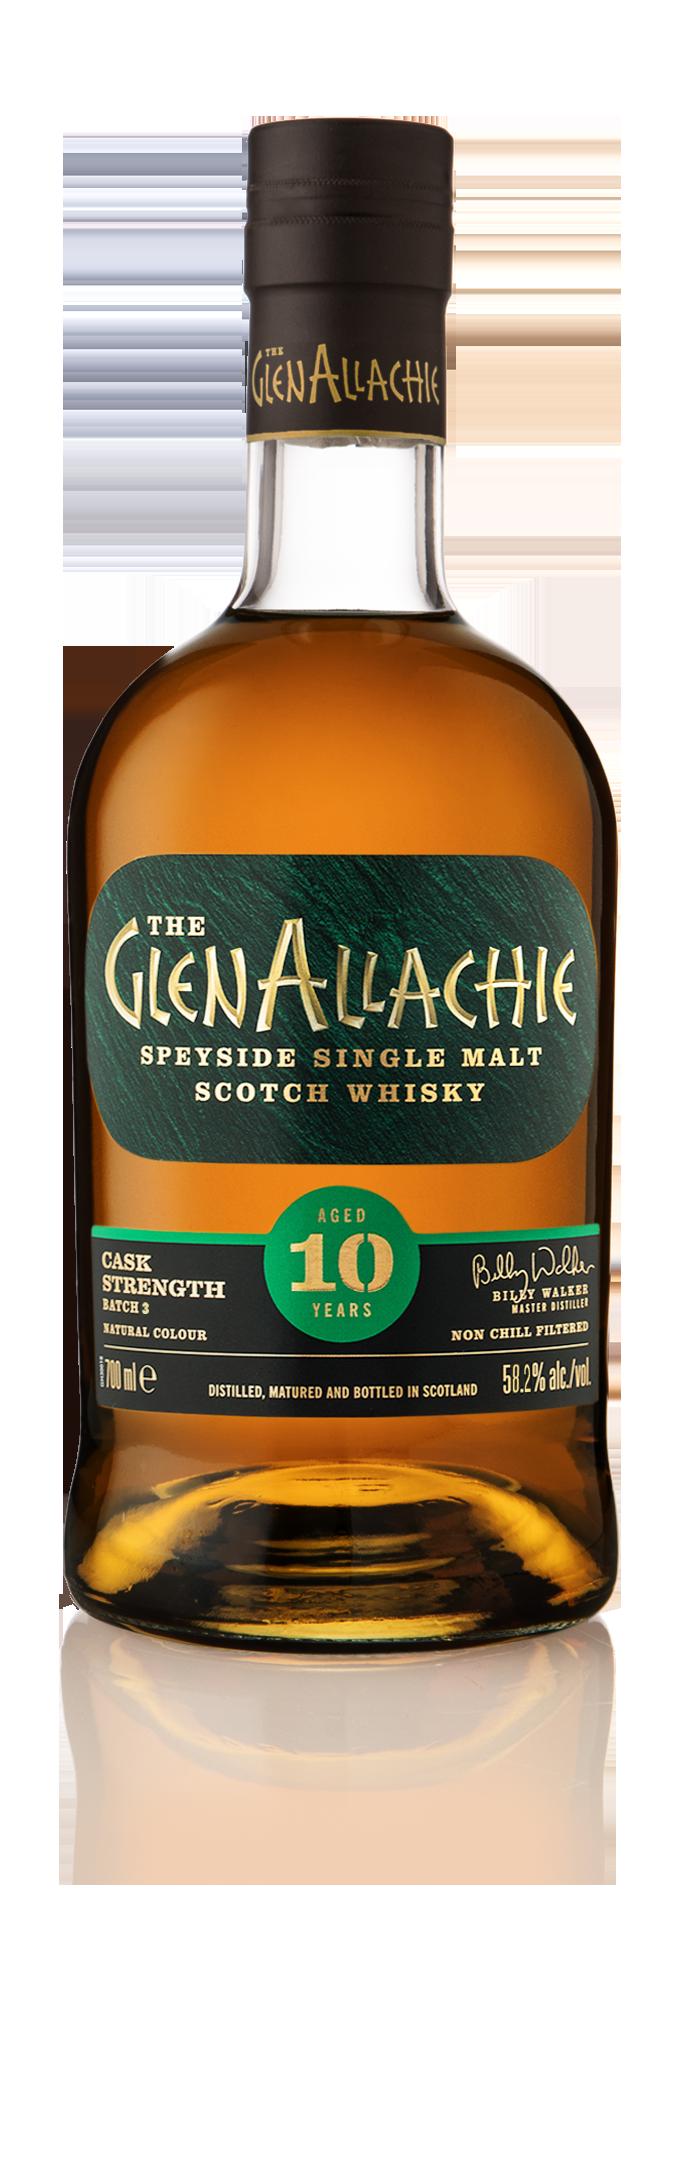 Glenallachie 10 yO Cask Strength - LADDE NER INFOBLAD